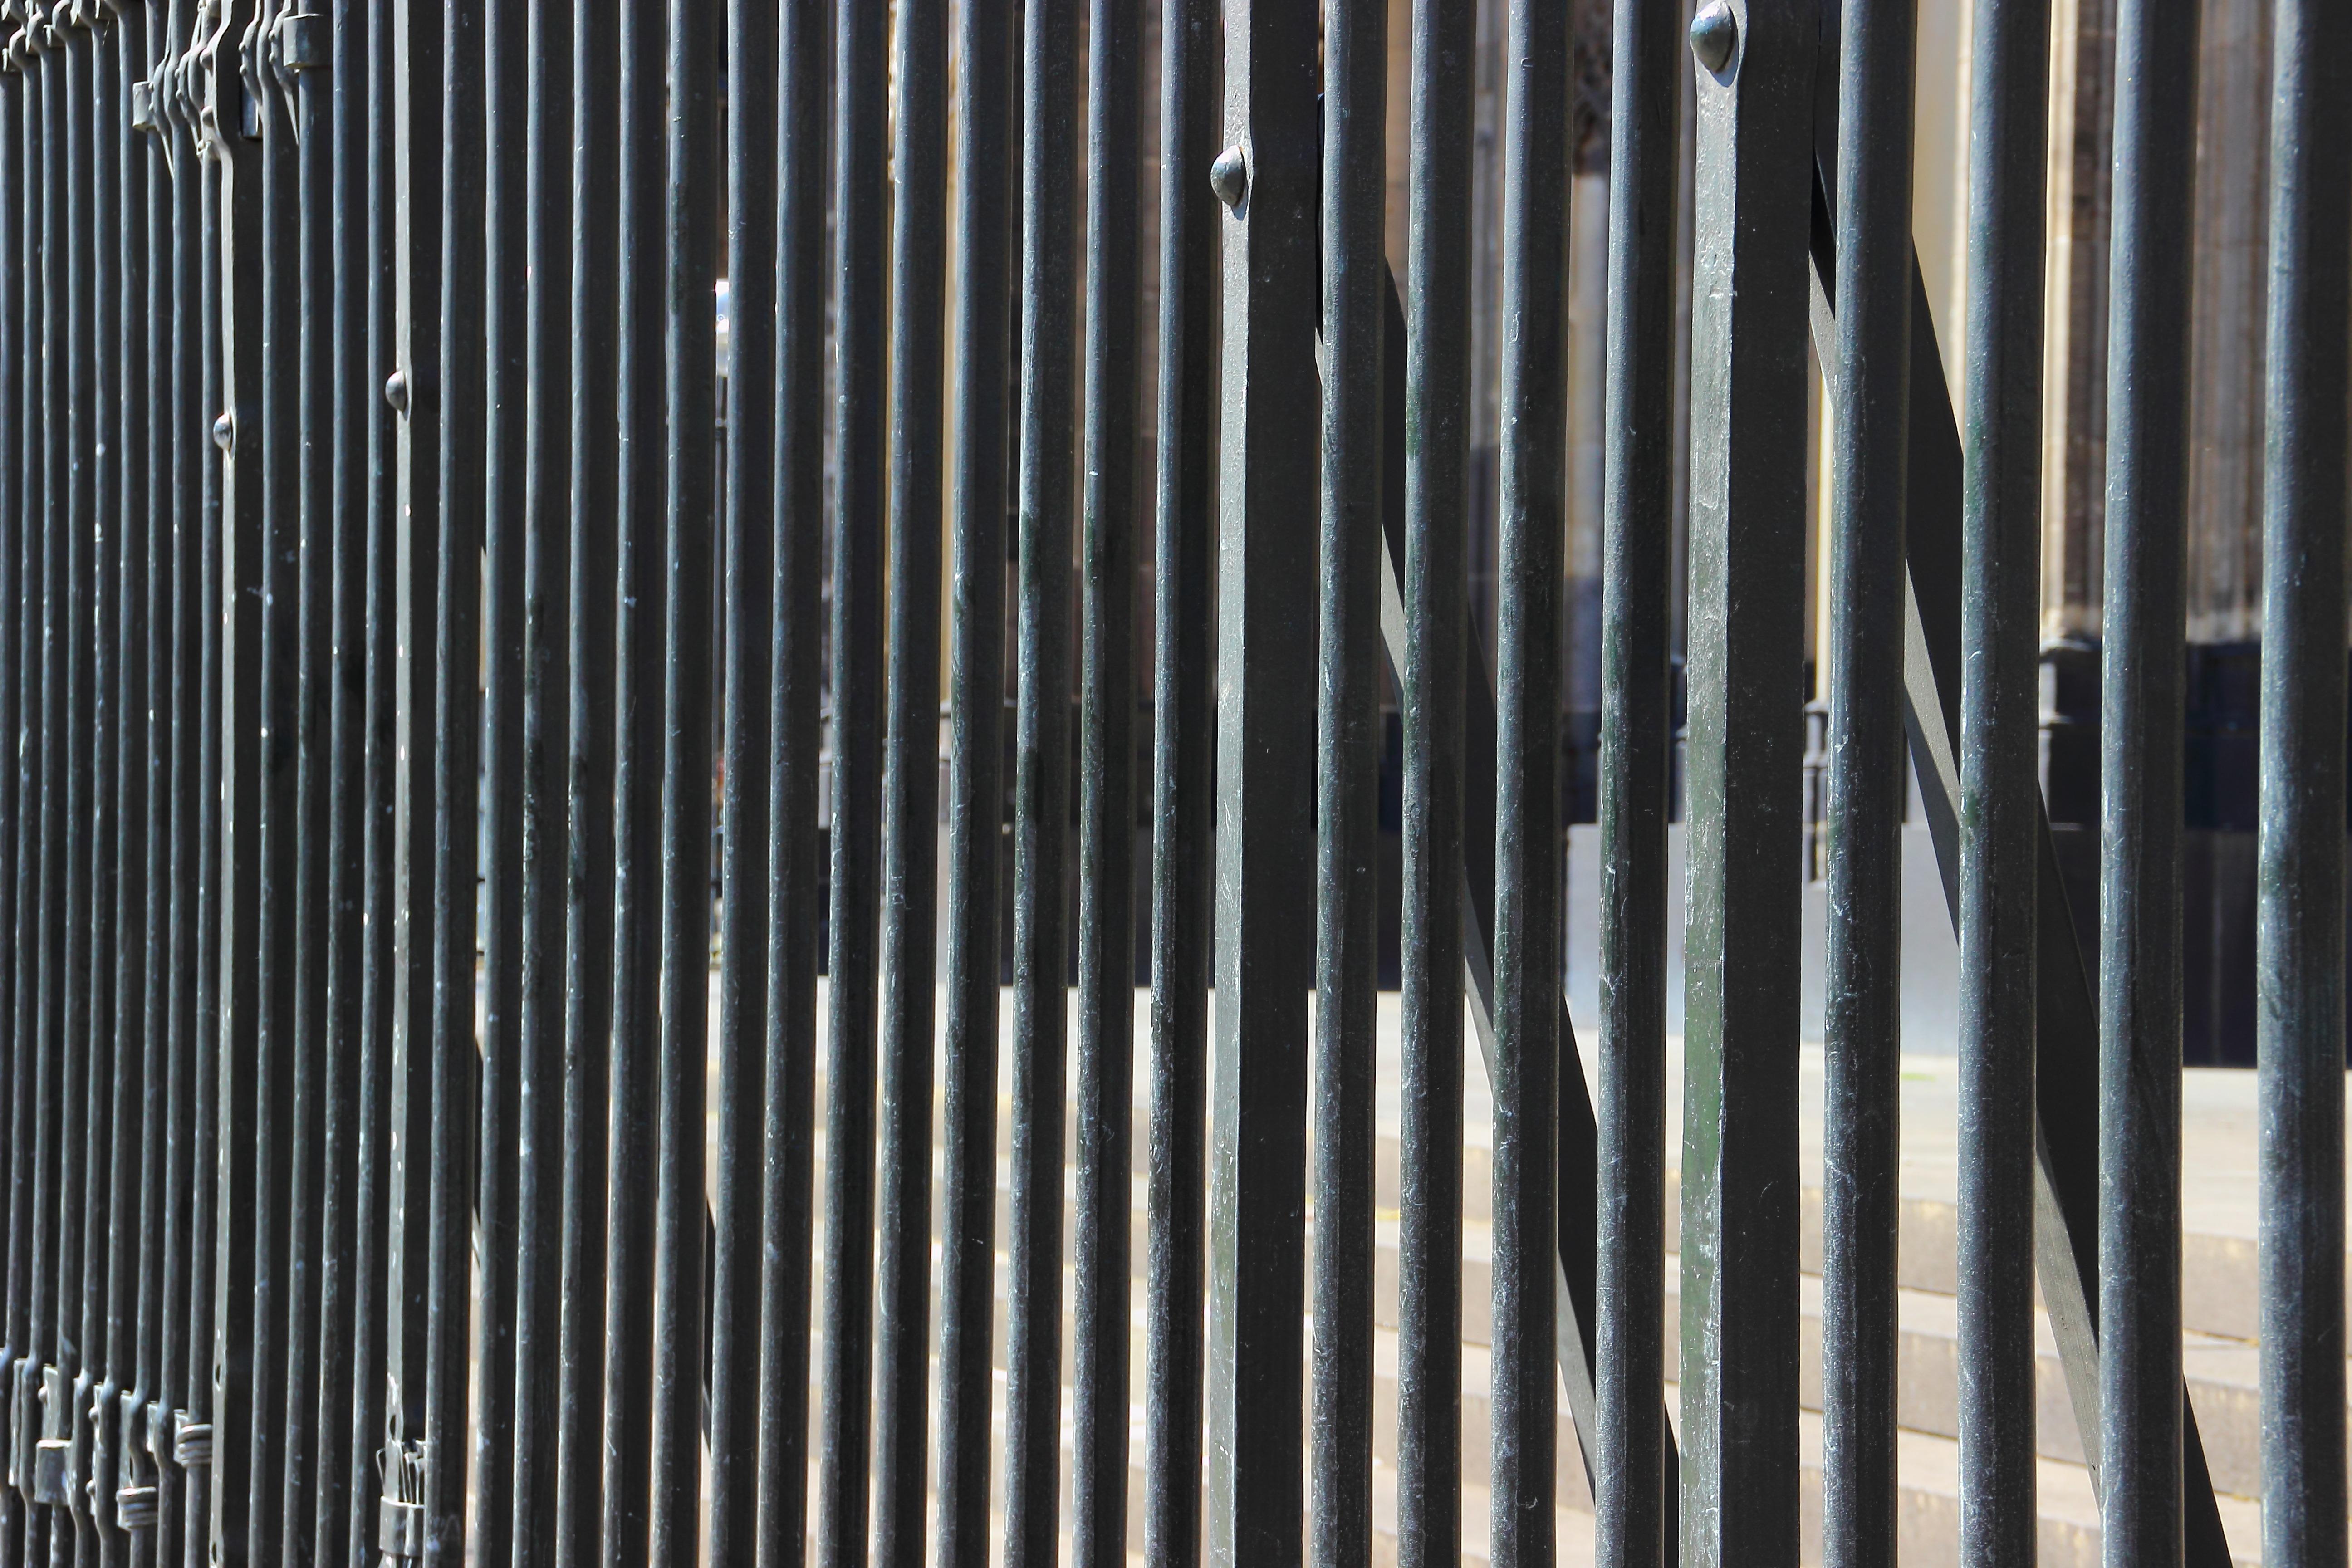 Fotos gratis : cerca, estructura, madera, textura, línea, metal ...